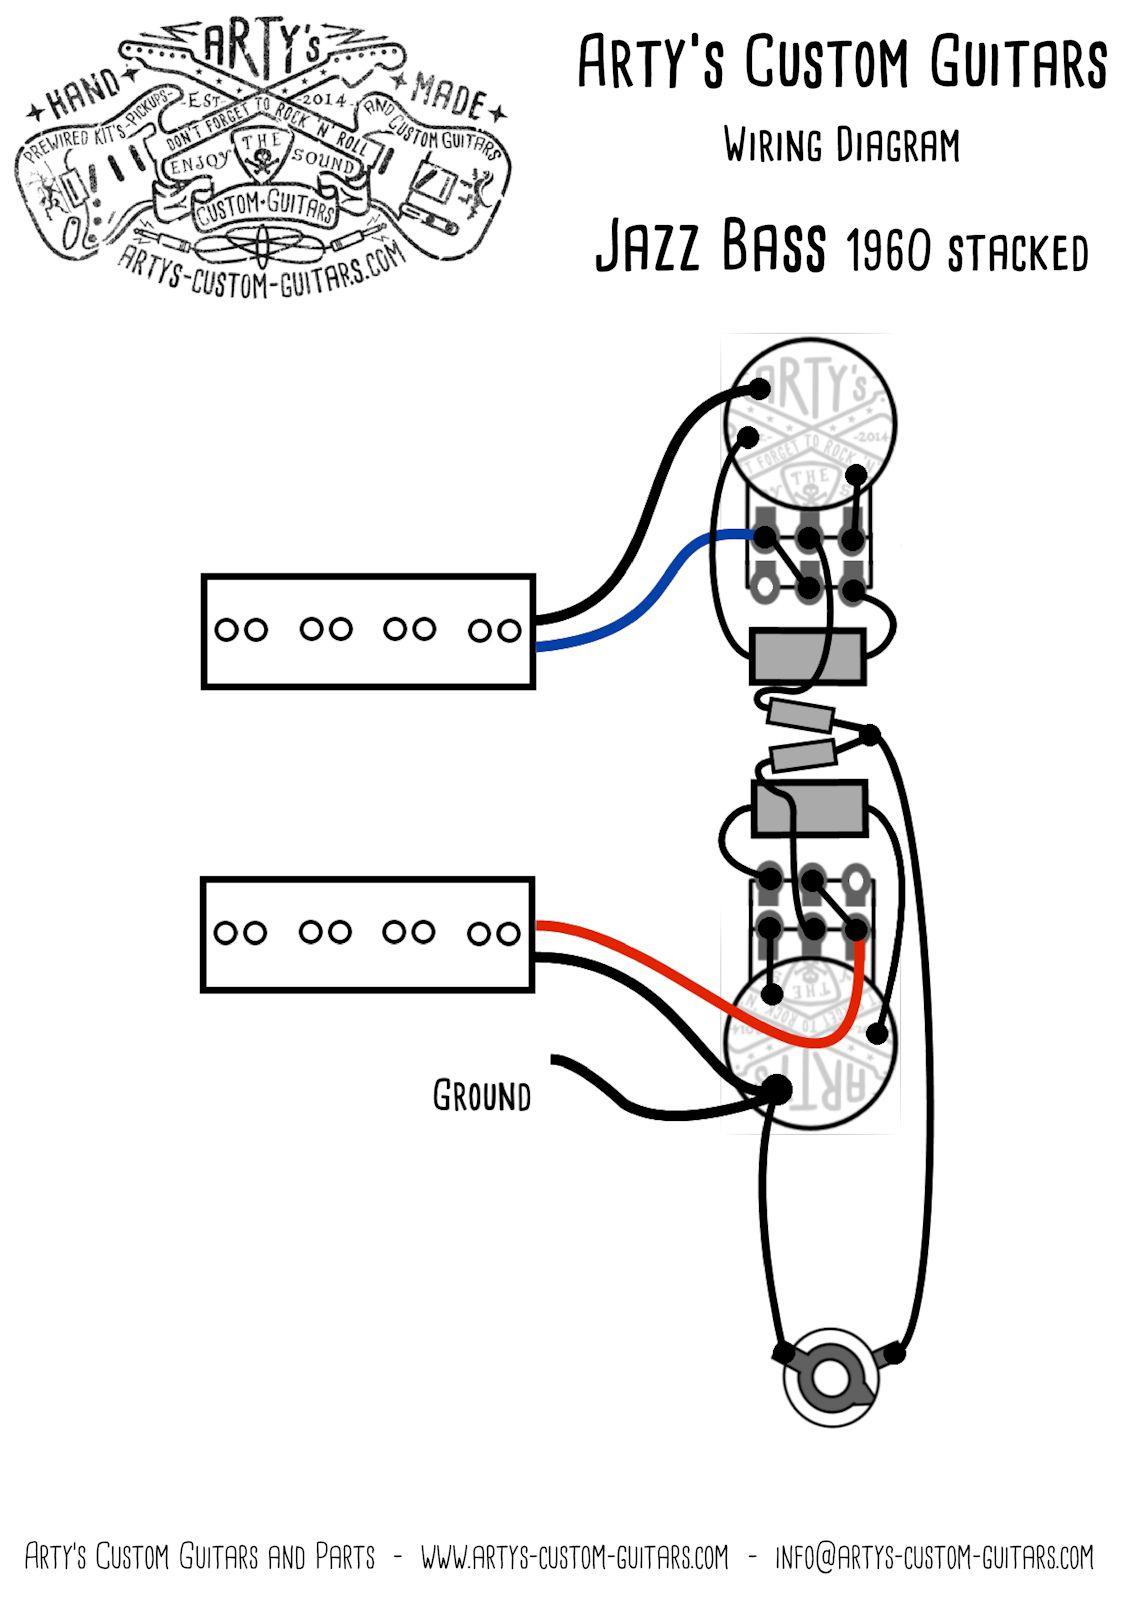 Perfect Ibanez Bass Guitar Wiring Diagram 76 In 5 Pin